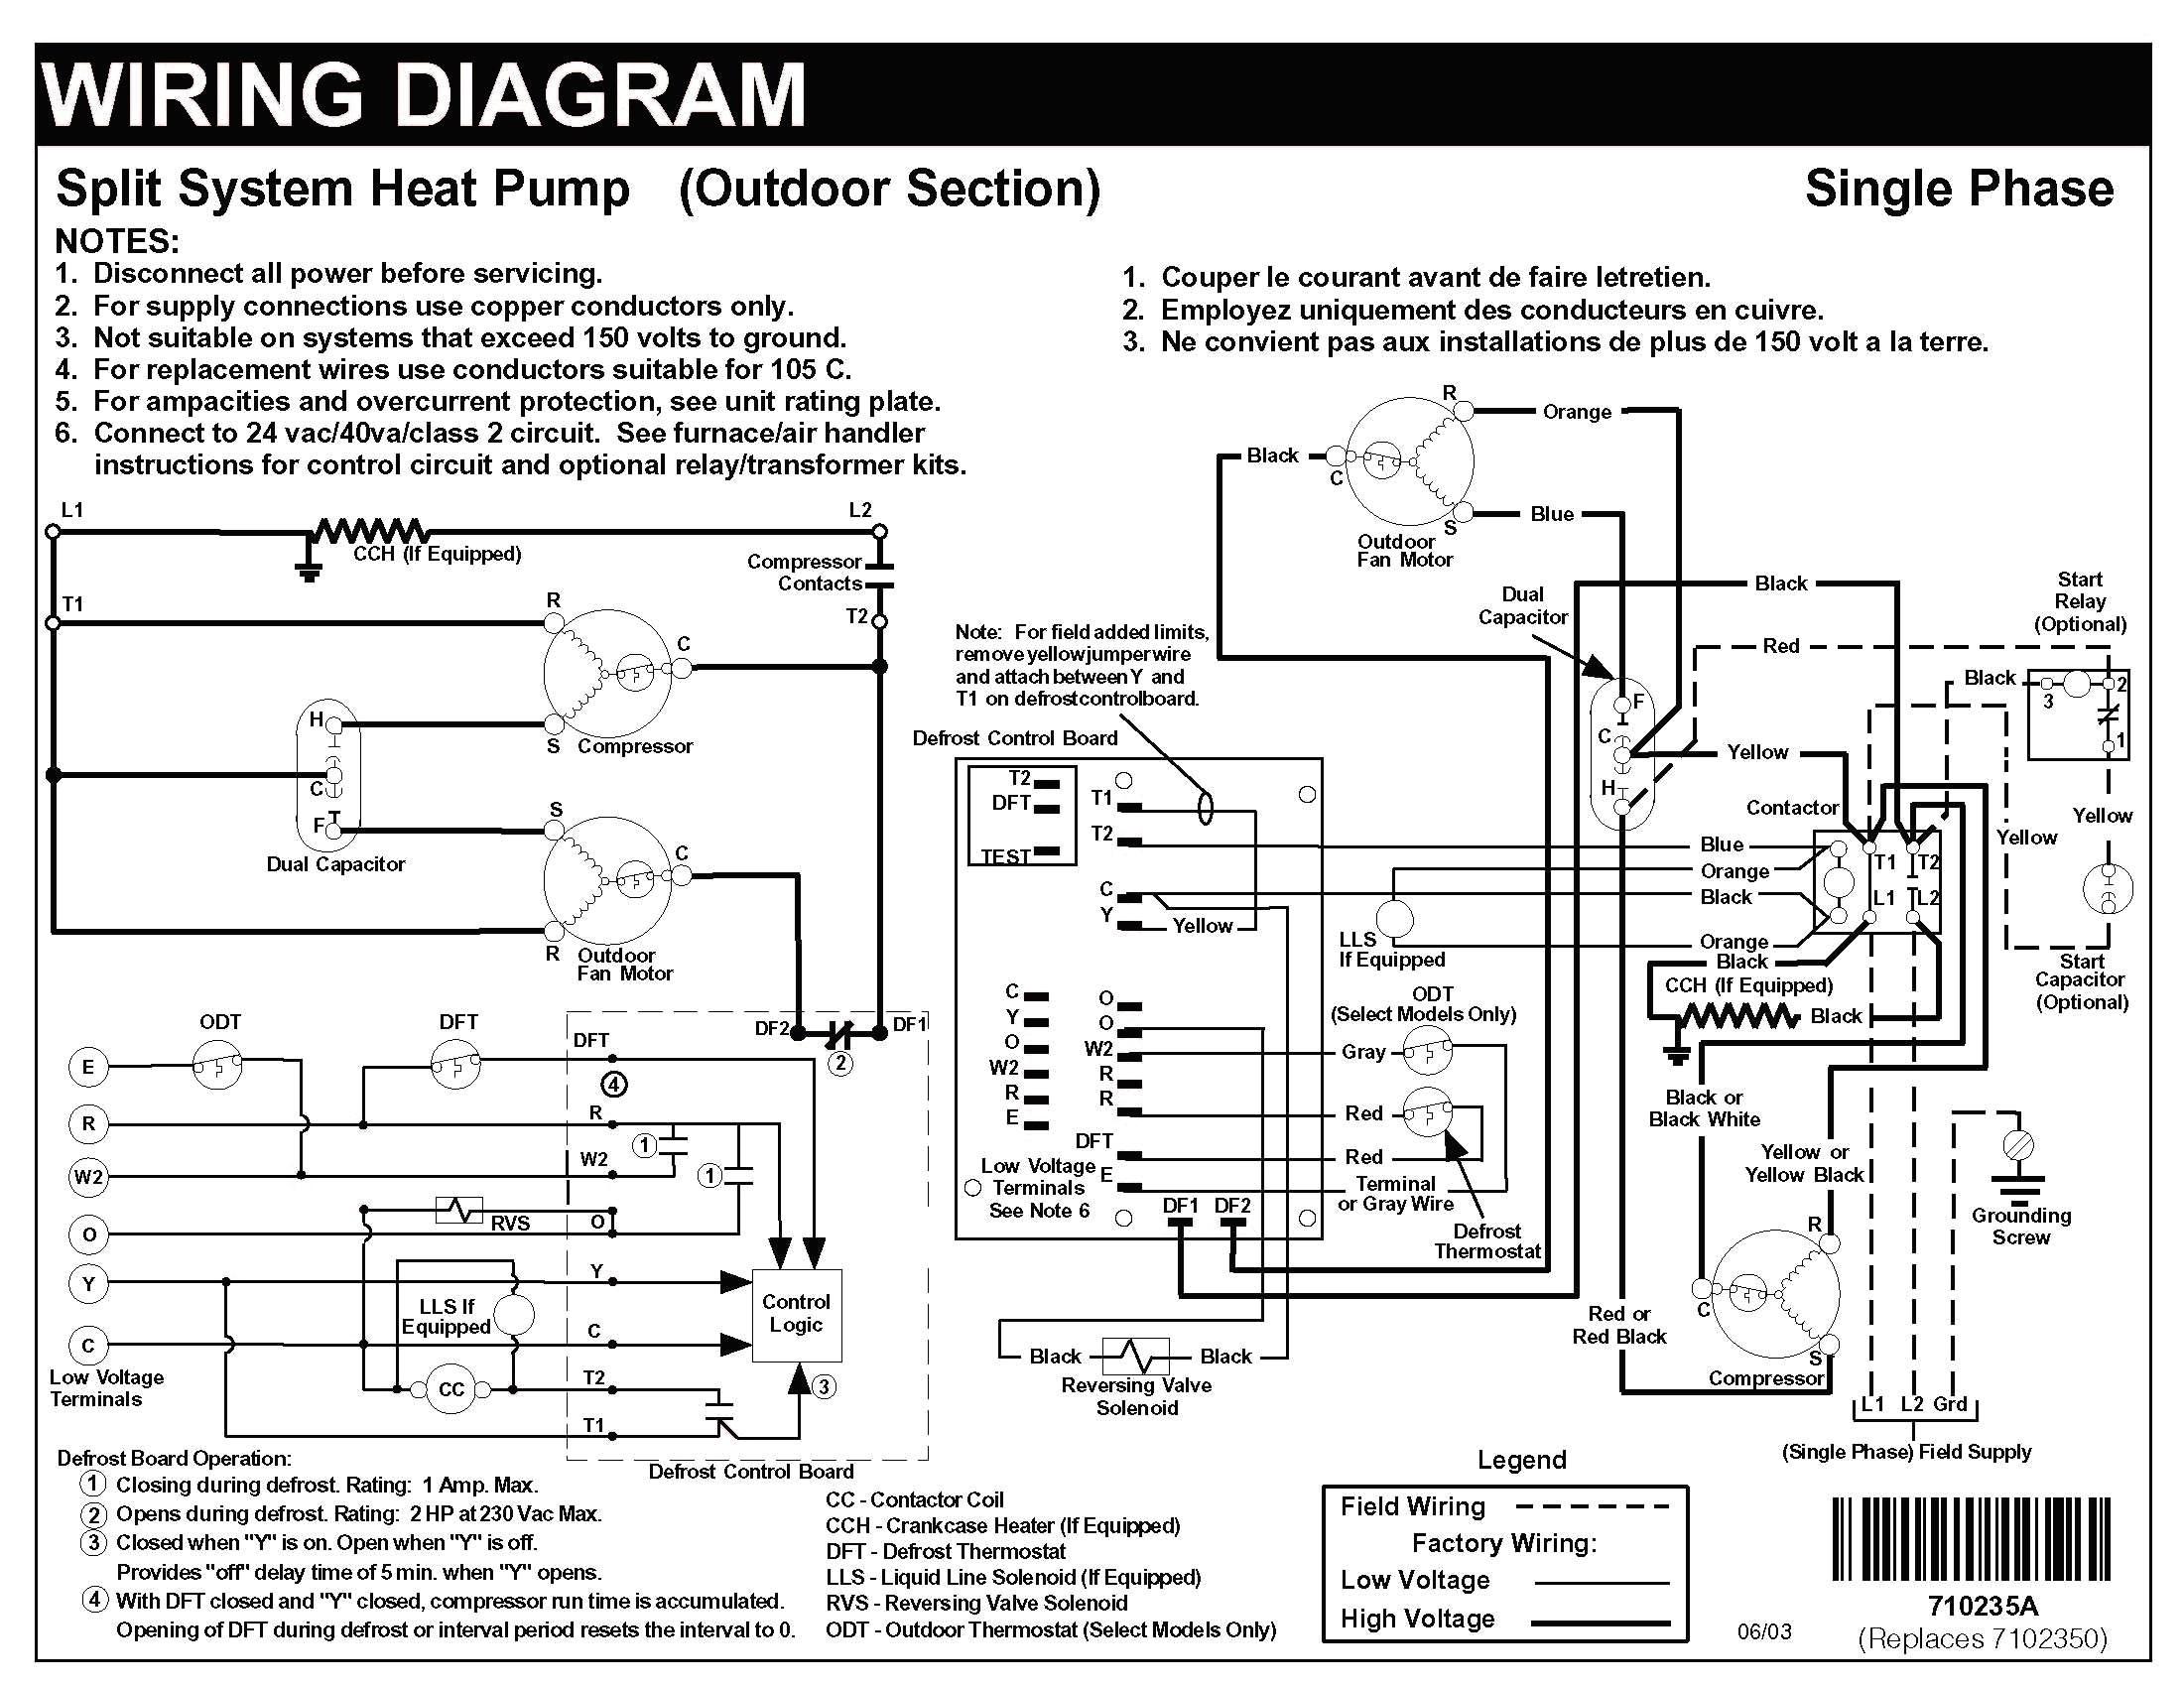 Goodman Air Handler Wiring Diagram - Kuwaitigenius - Goodman Heat Pump Wiring Diagram